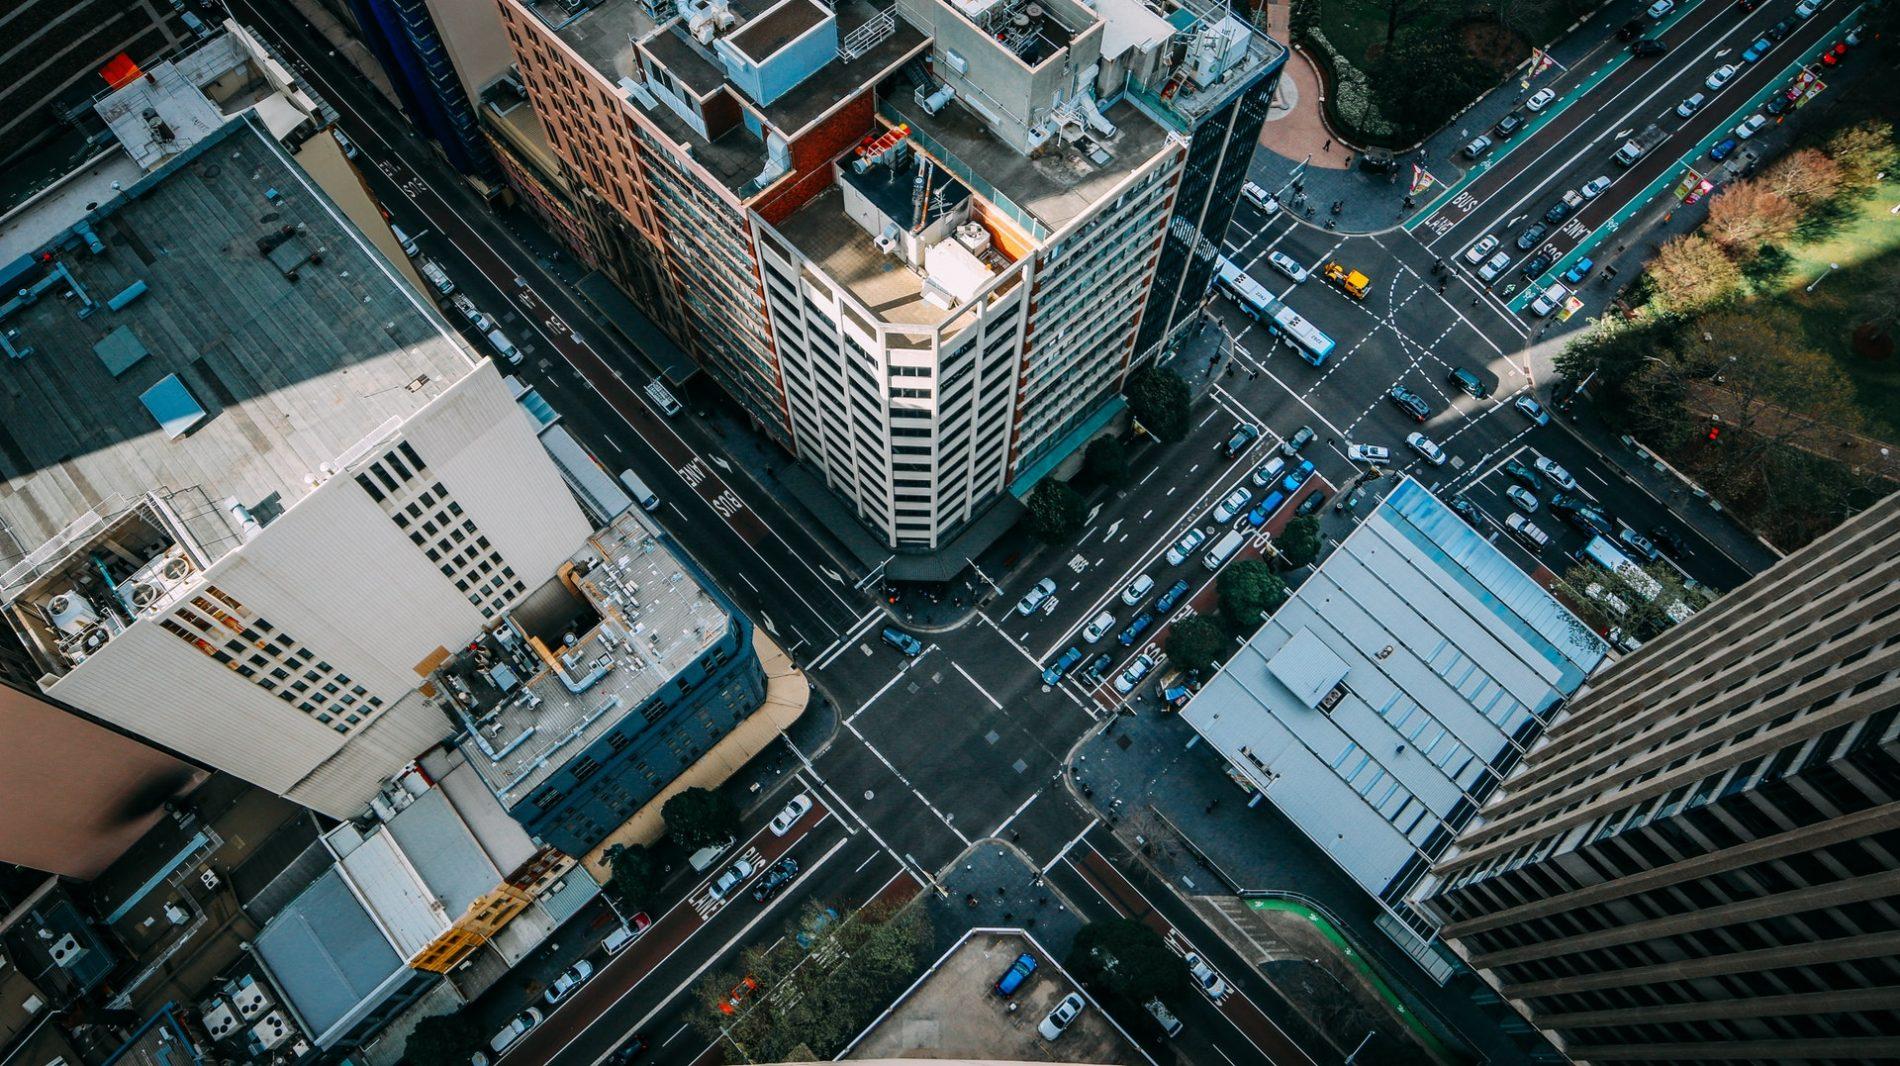 city-top-view - APQ Global Limited (LON:APQ)